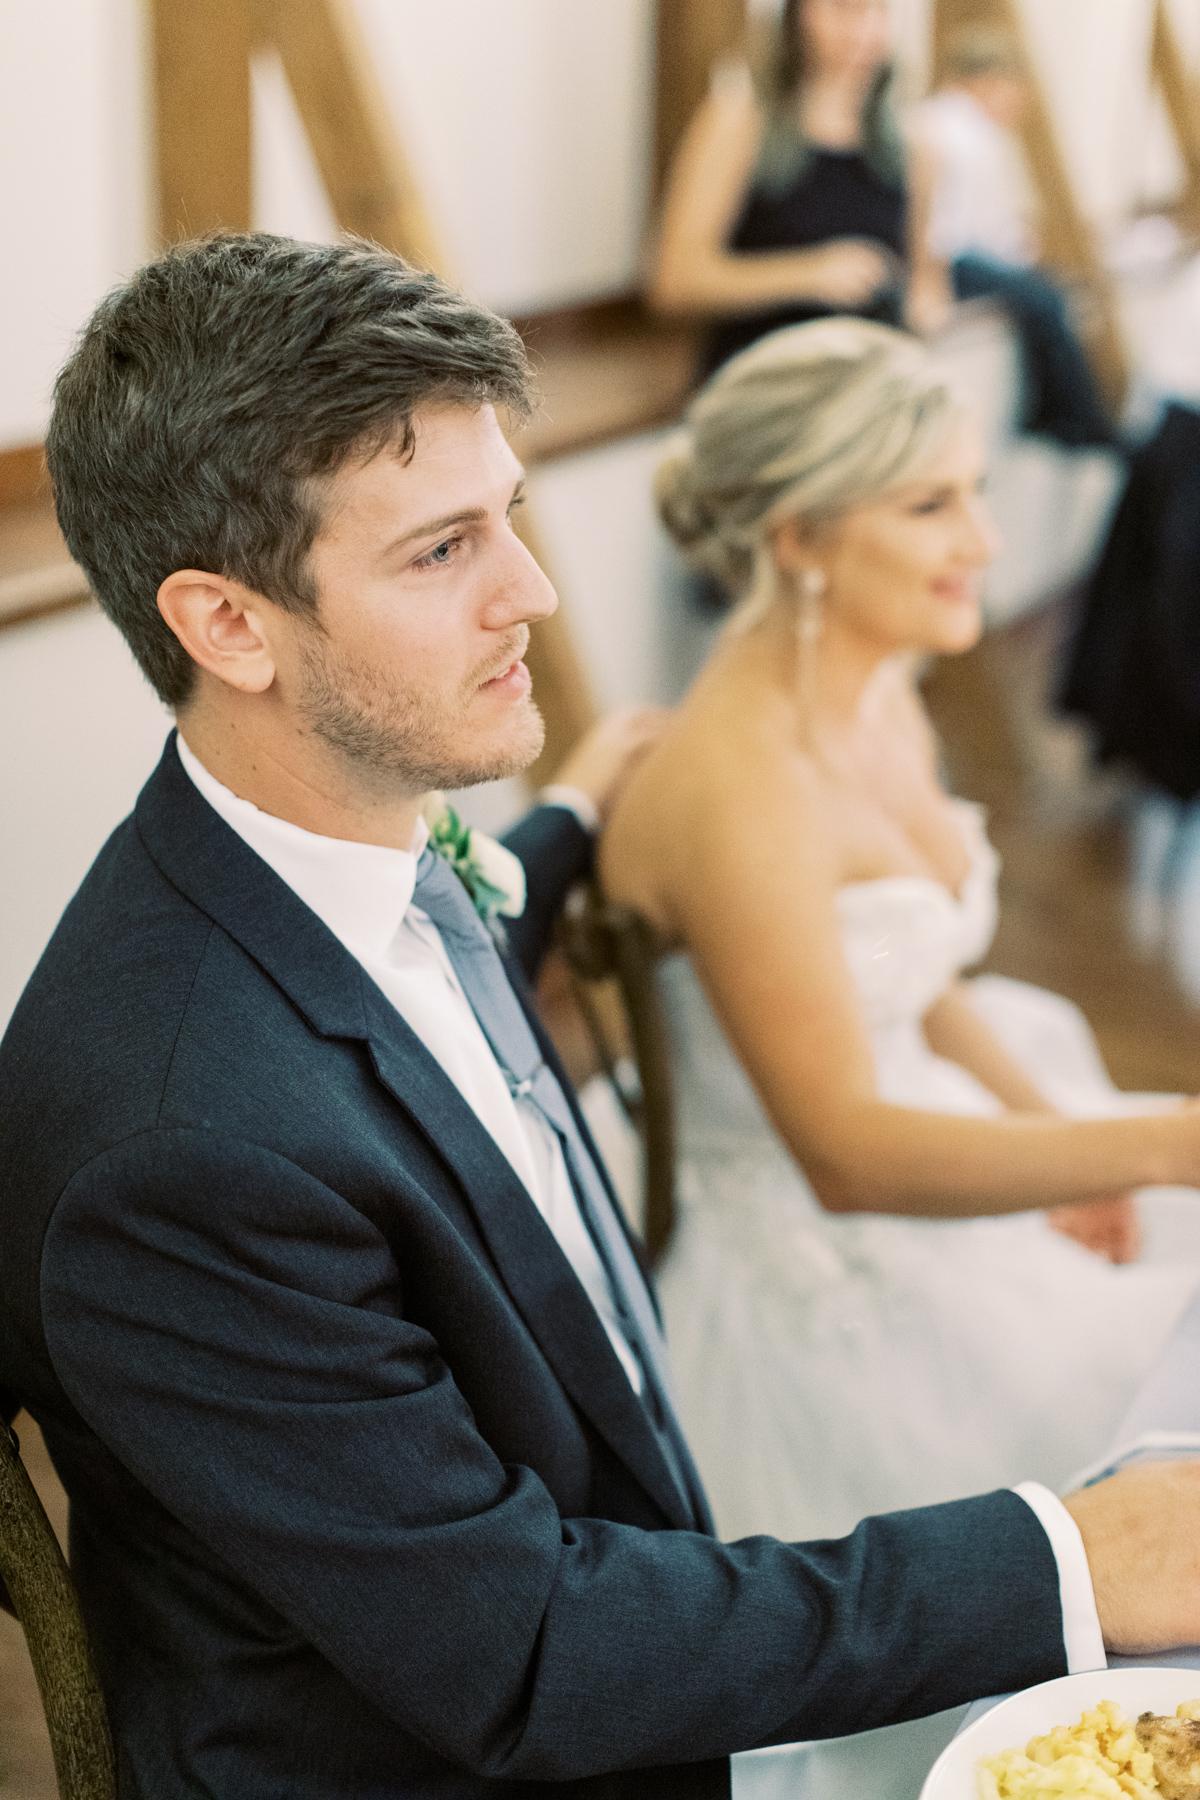 winmock-kinderton-wedding-066.jpg